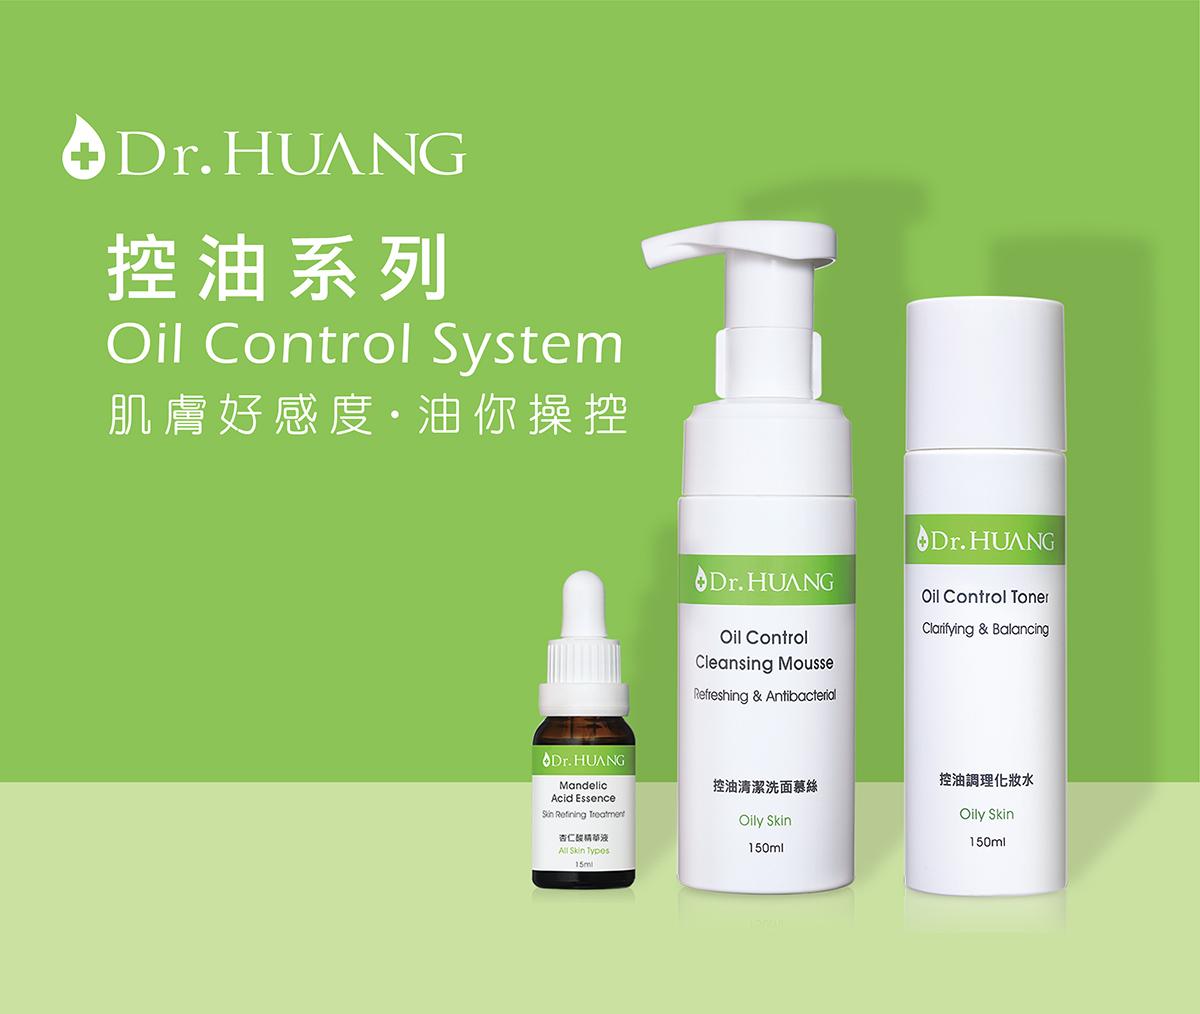 Dr.HUANG控油系列重新定義健康肌解決油肌困擾